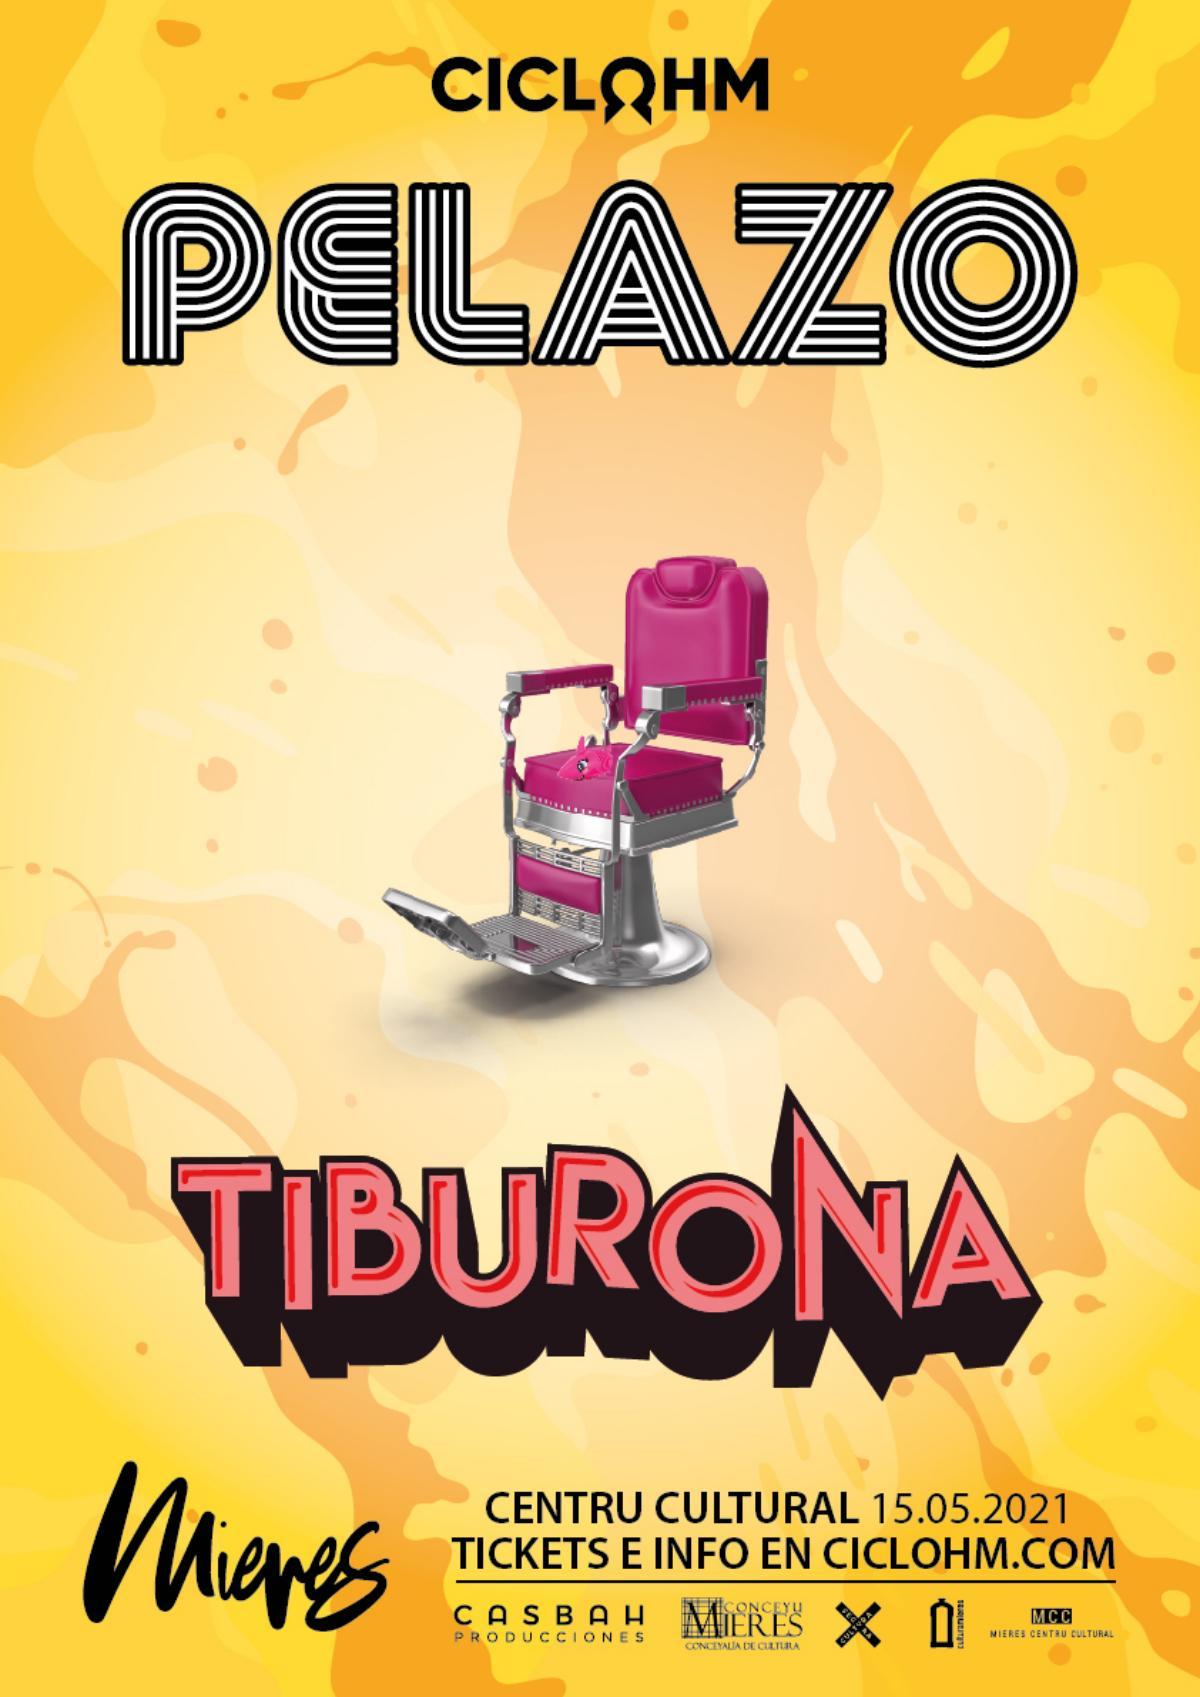 Ciclo Hm Pelazo Tiburona Mieres Web